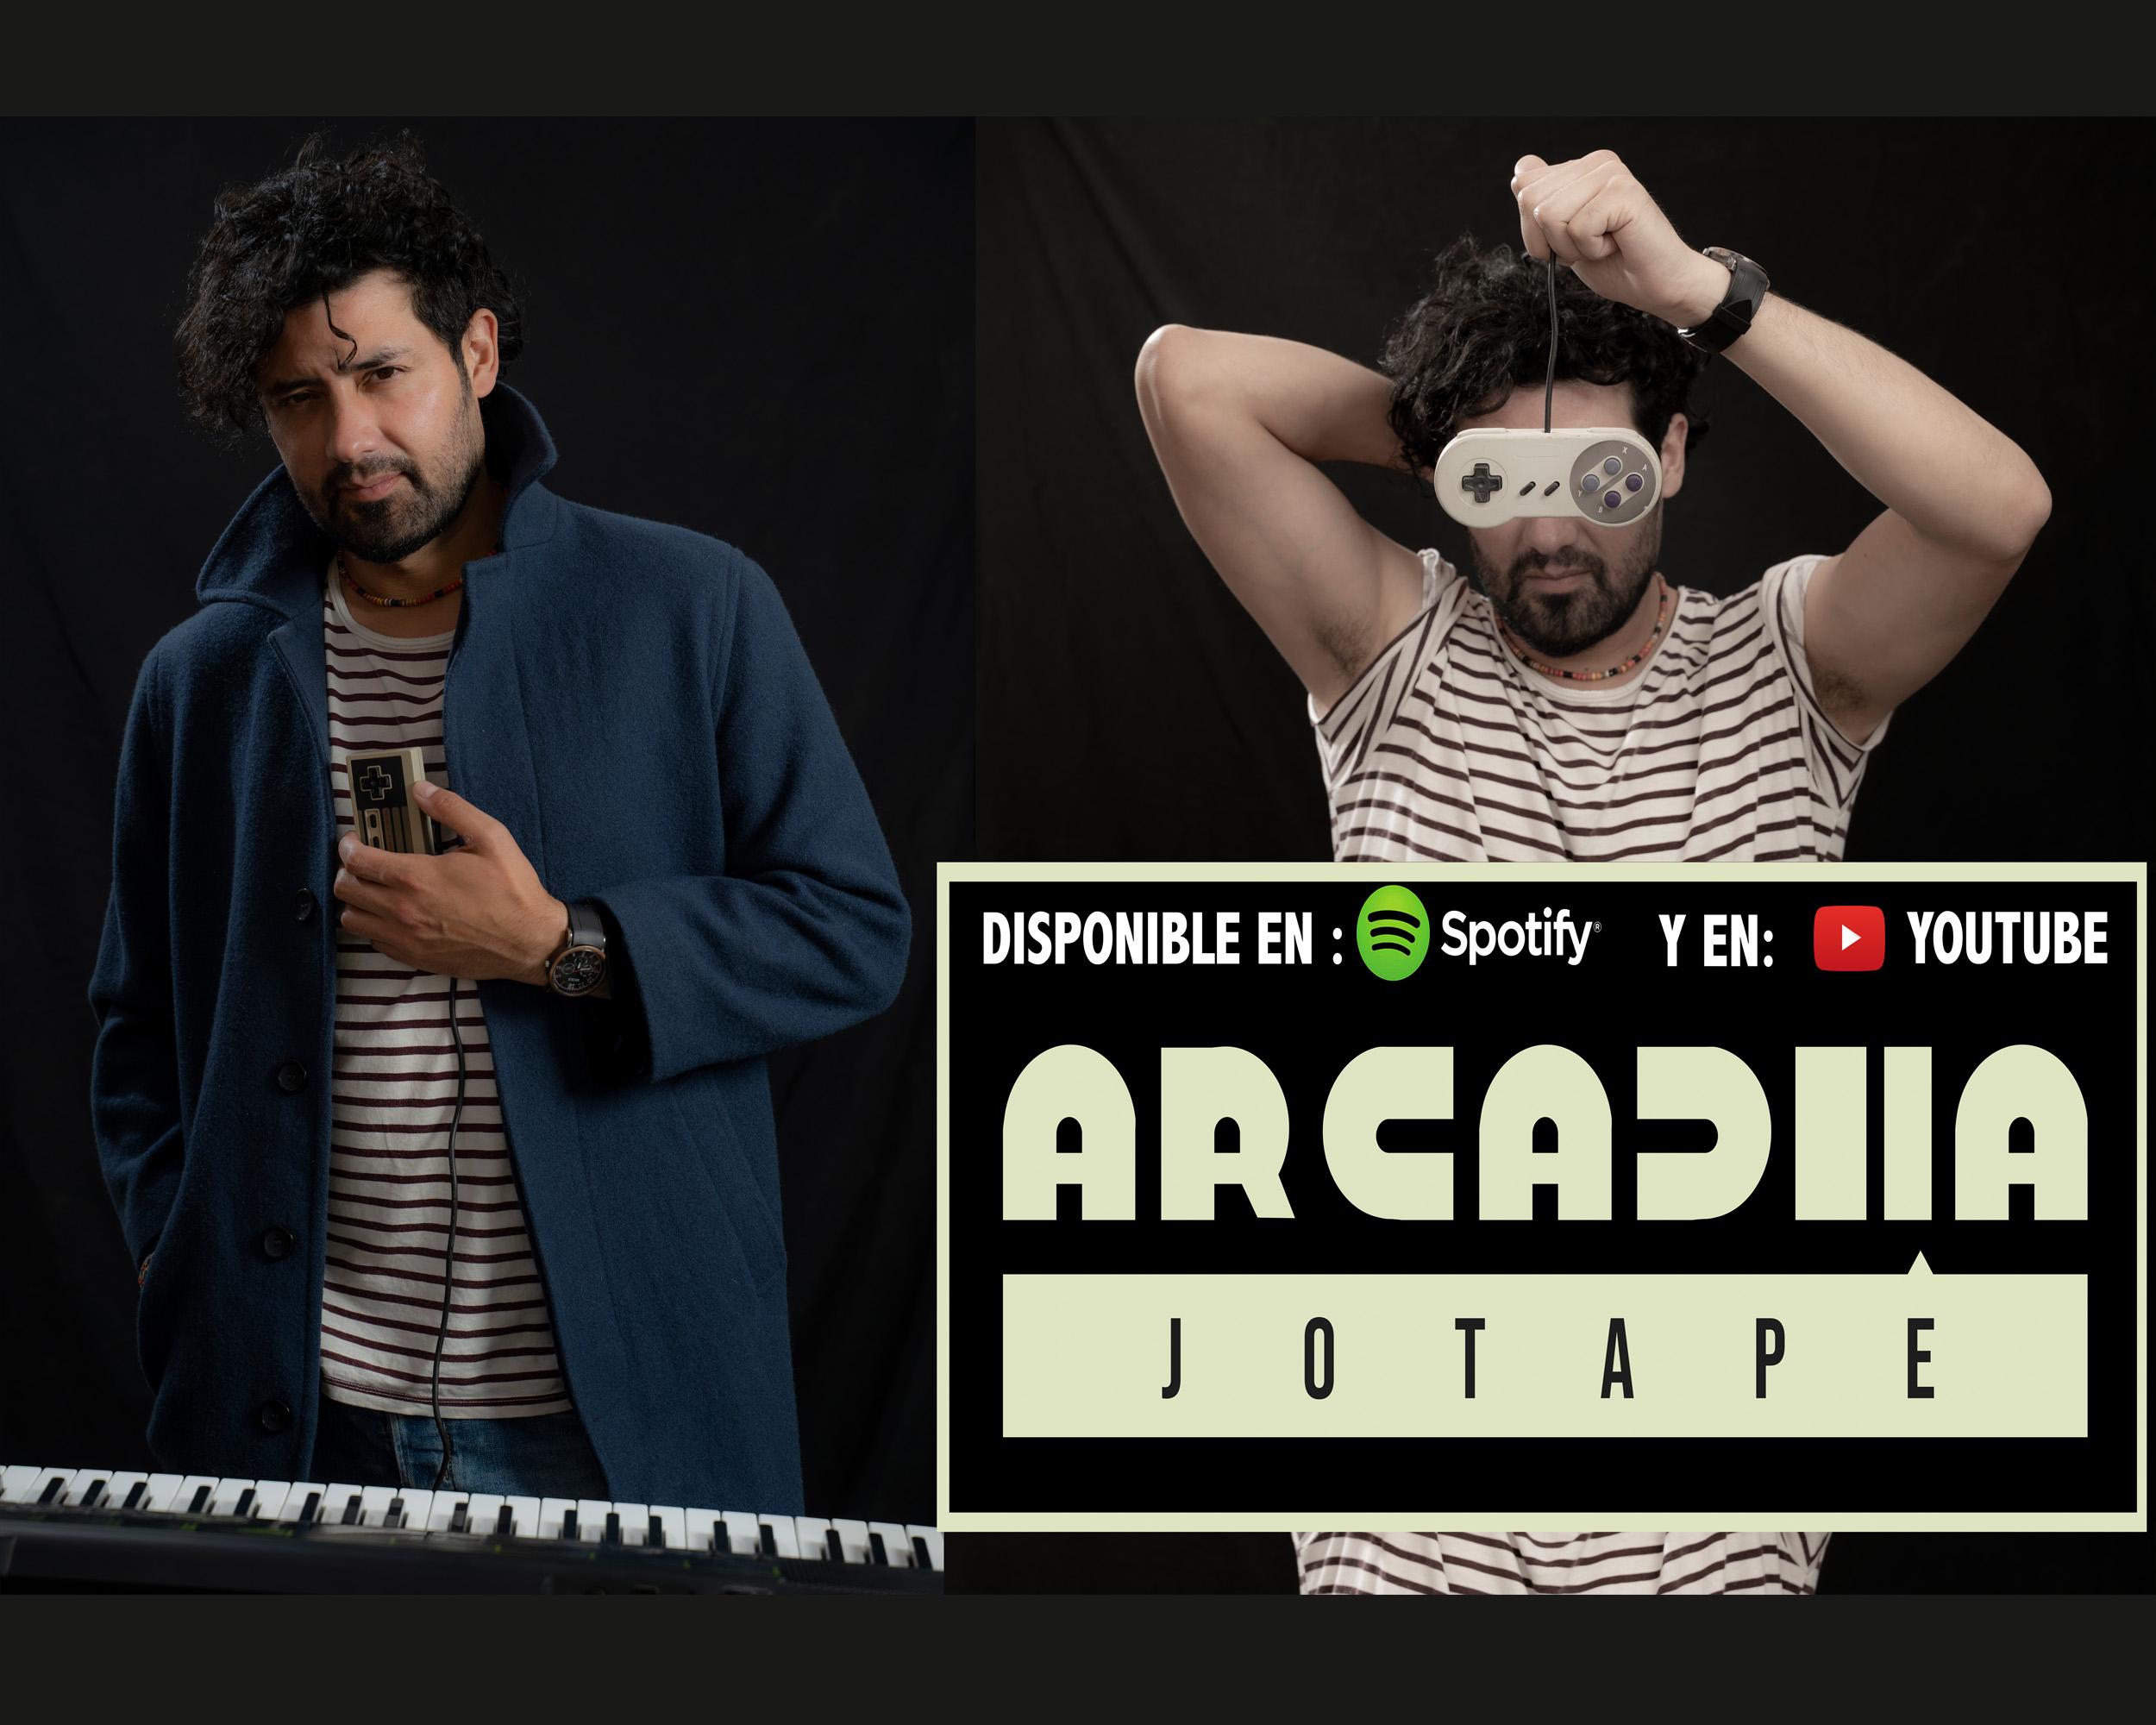 Jotapé estrena nuevo álbum «Arcadia»